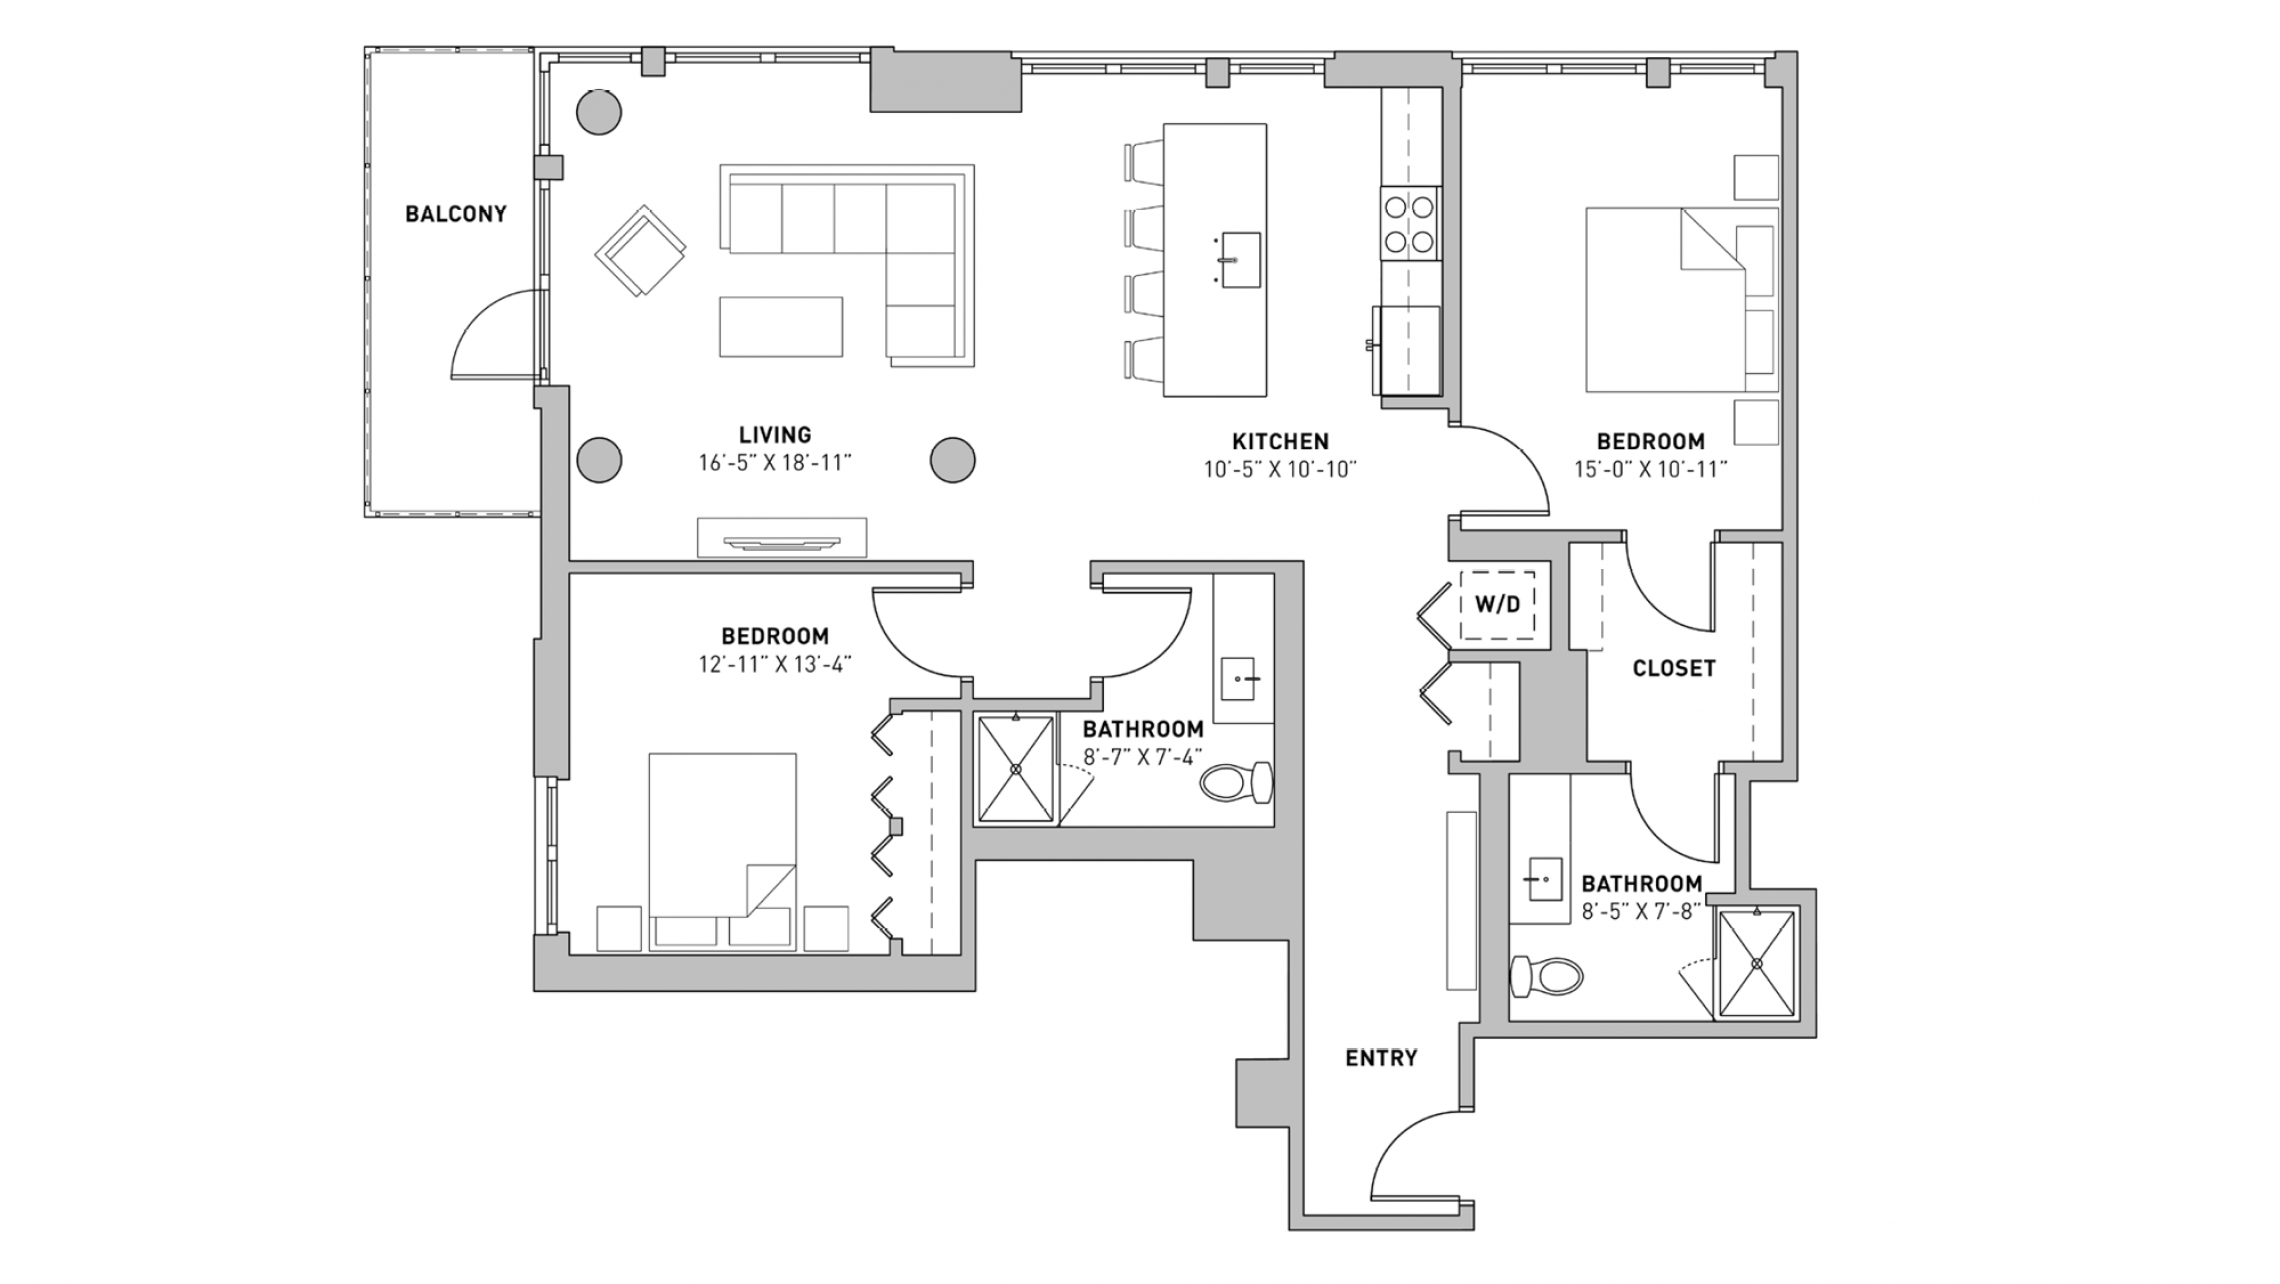 ULI The Pressman 801 - Two Bedroom, Two Bathroom